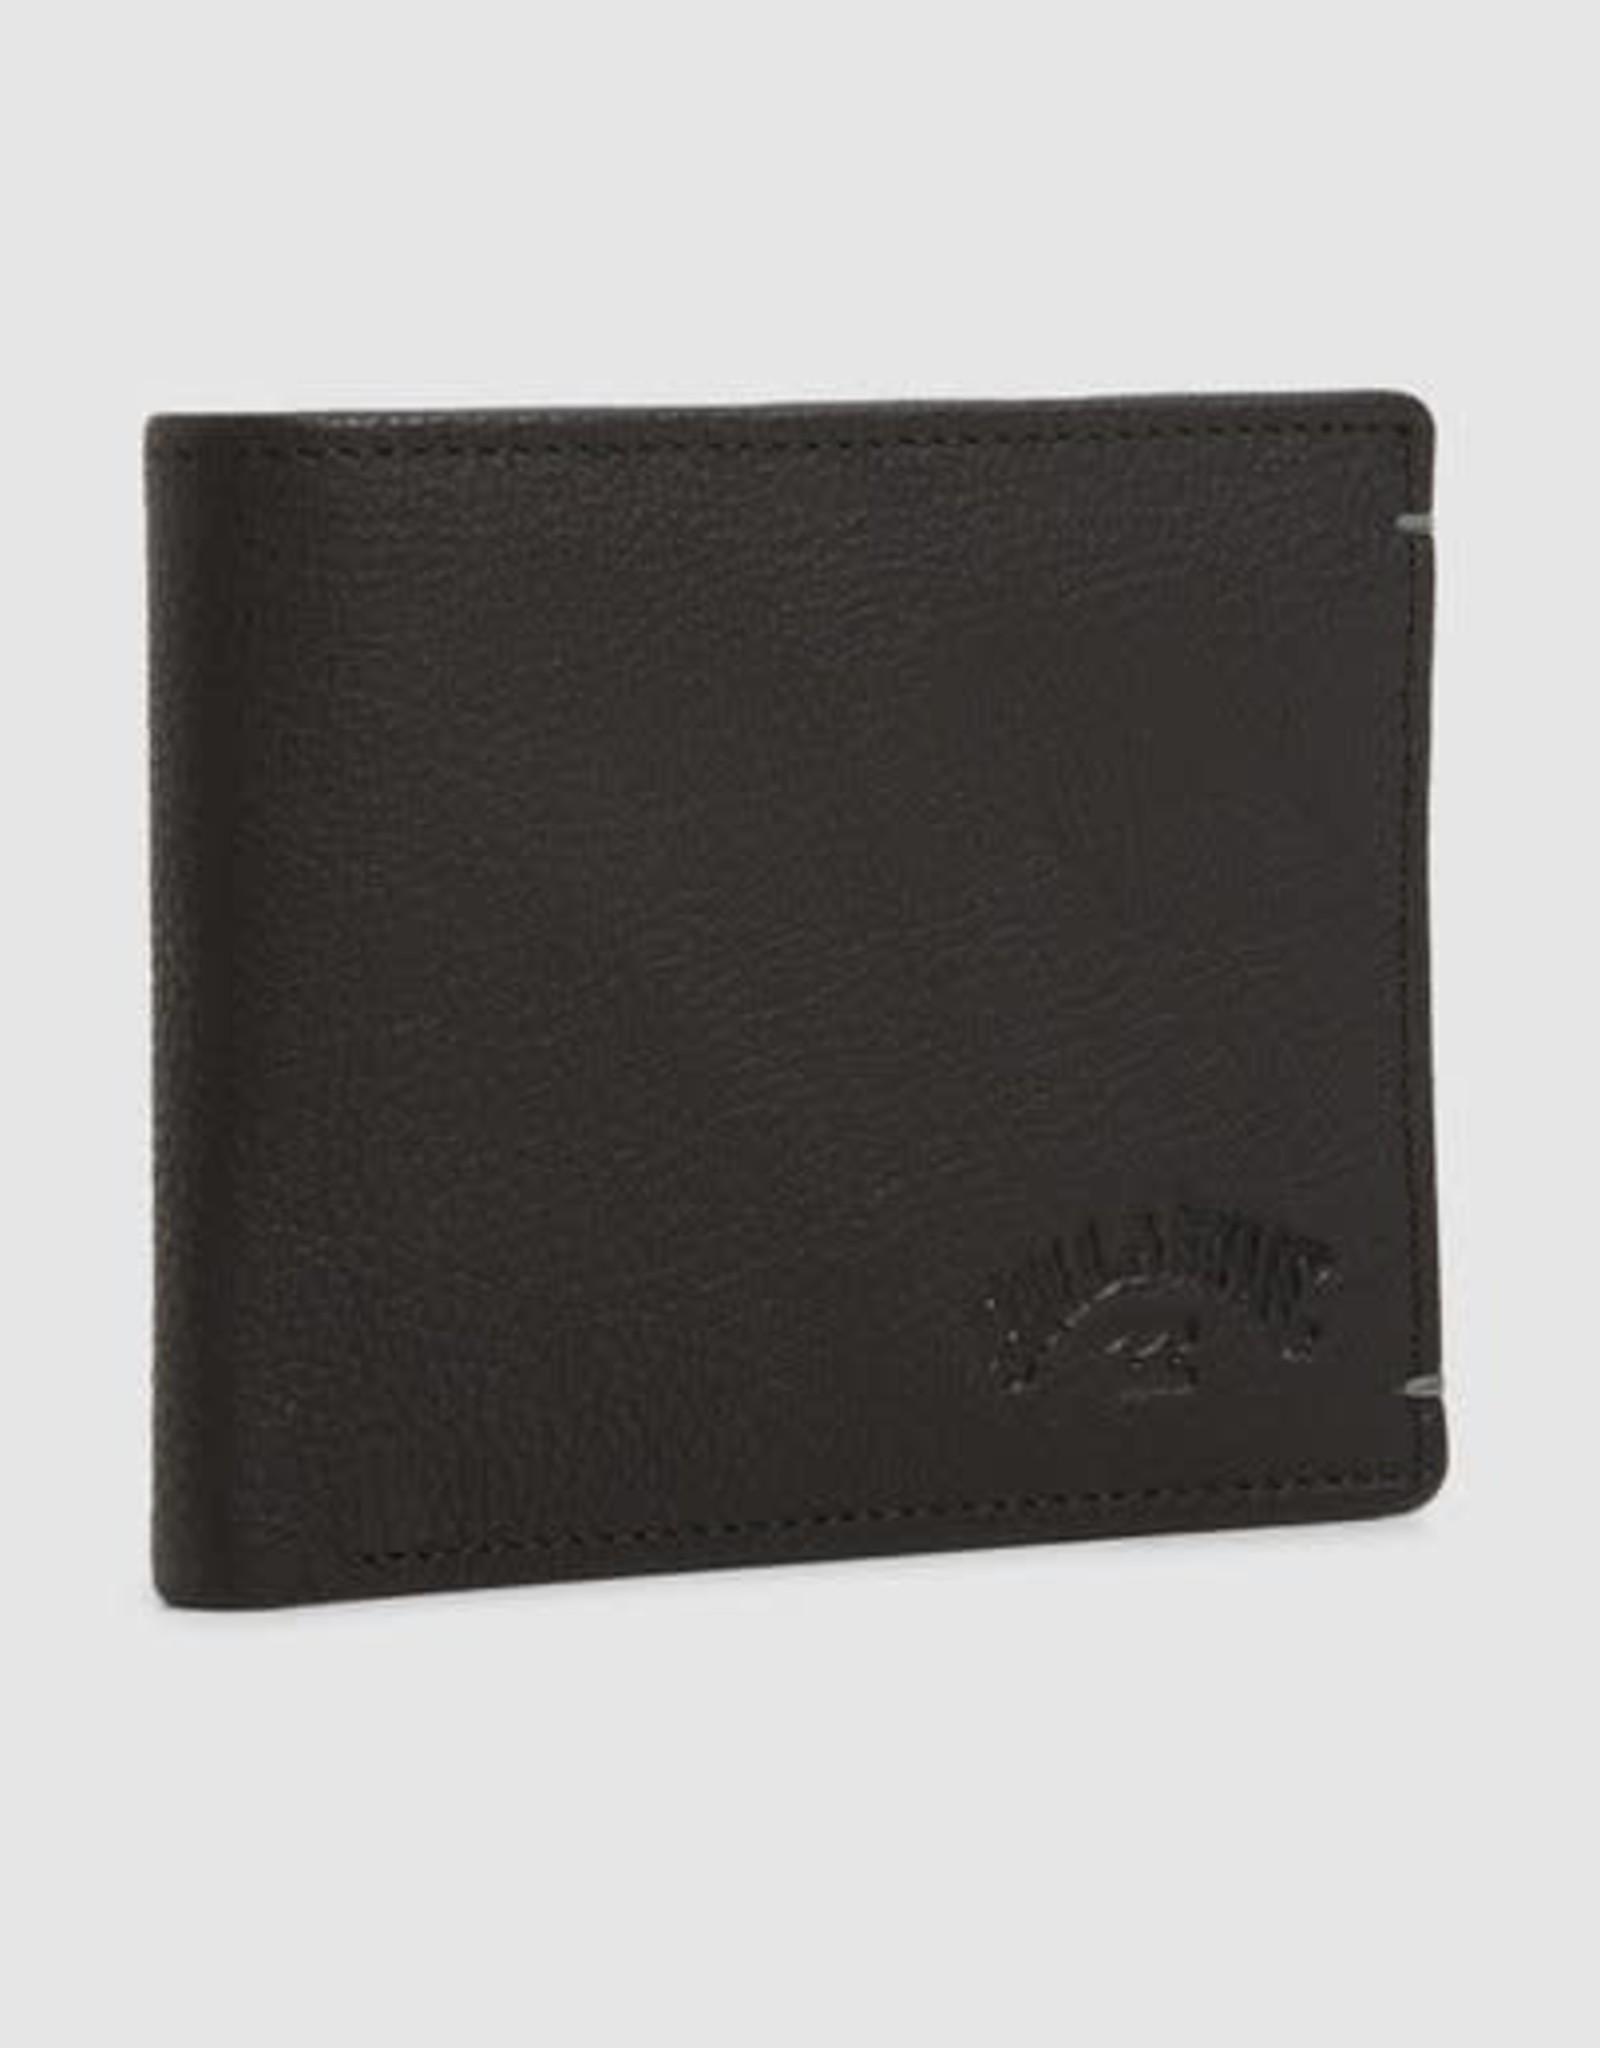 BILLABONG Rockaway RFID 2 in 1 Wallet